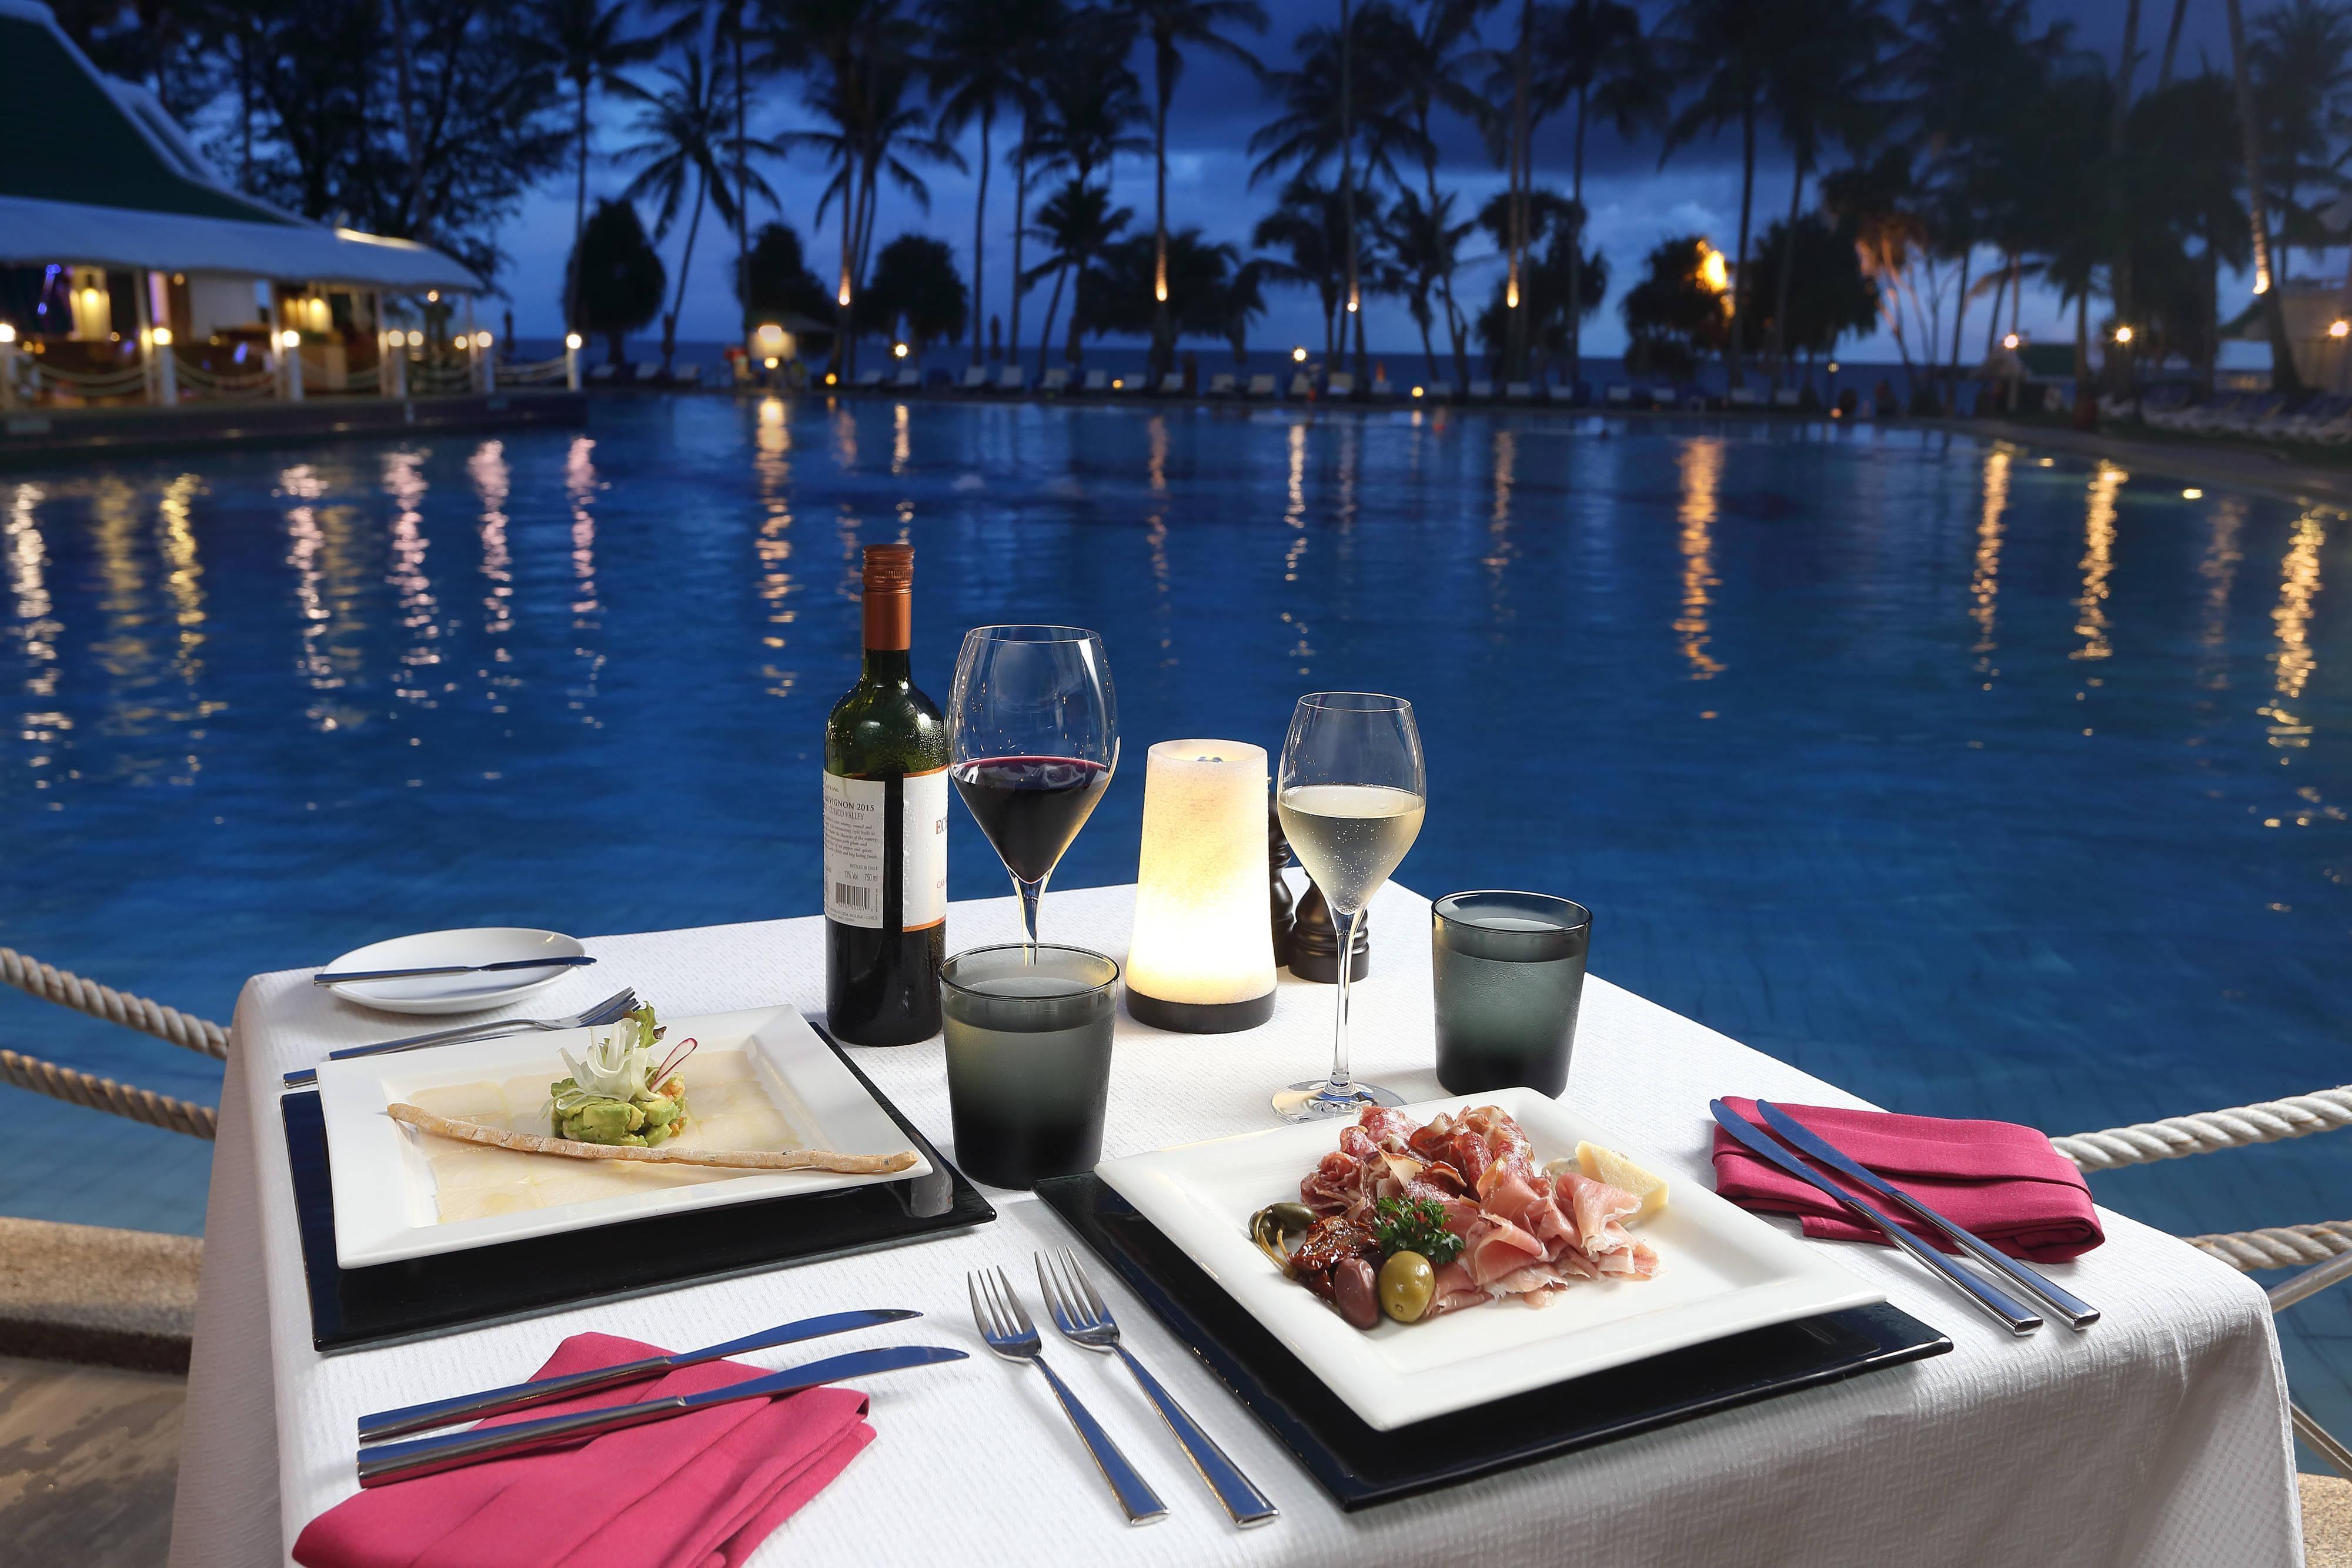 Portofino Italian Restaurant Poolside Terrace